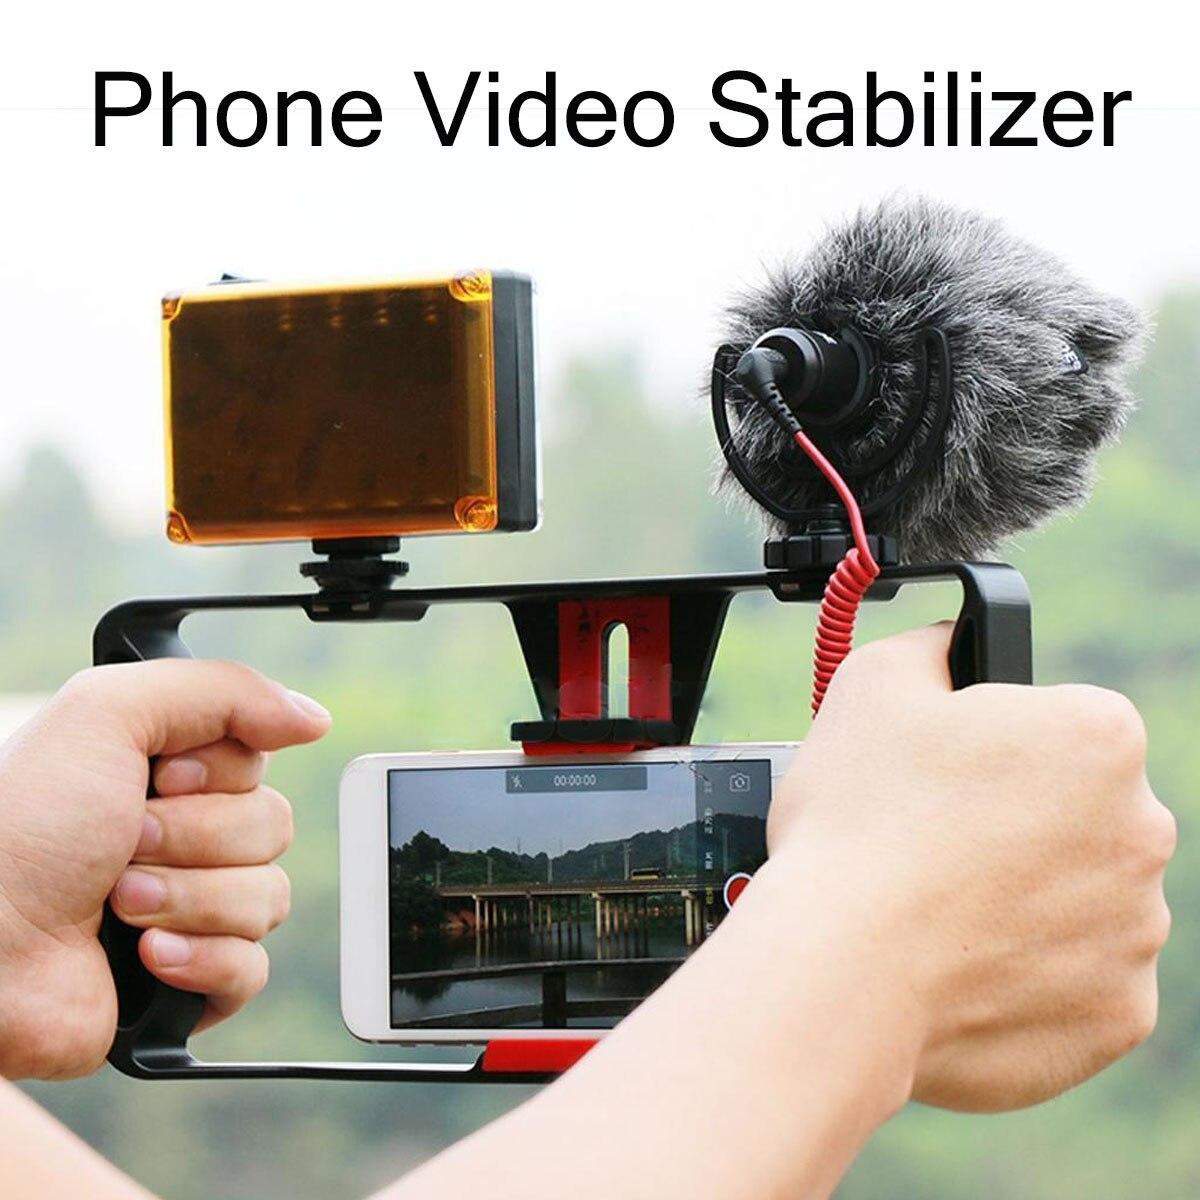 Cámara de vídeo portátil jaula Anti-vibración Cámara protectora mango estabilizador caso al aire libre ver Smartphone reproducción de vídeo